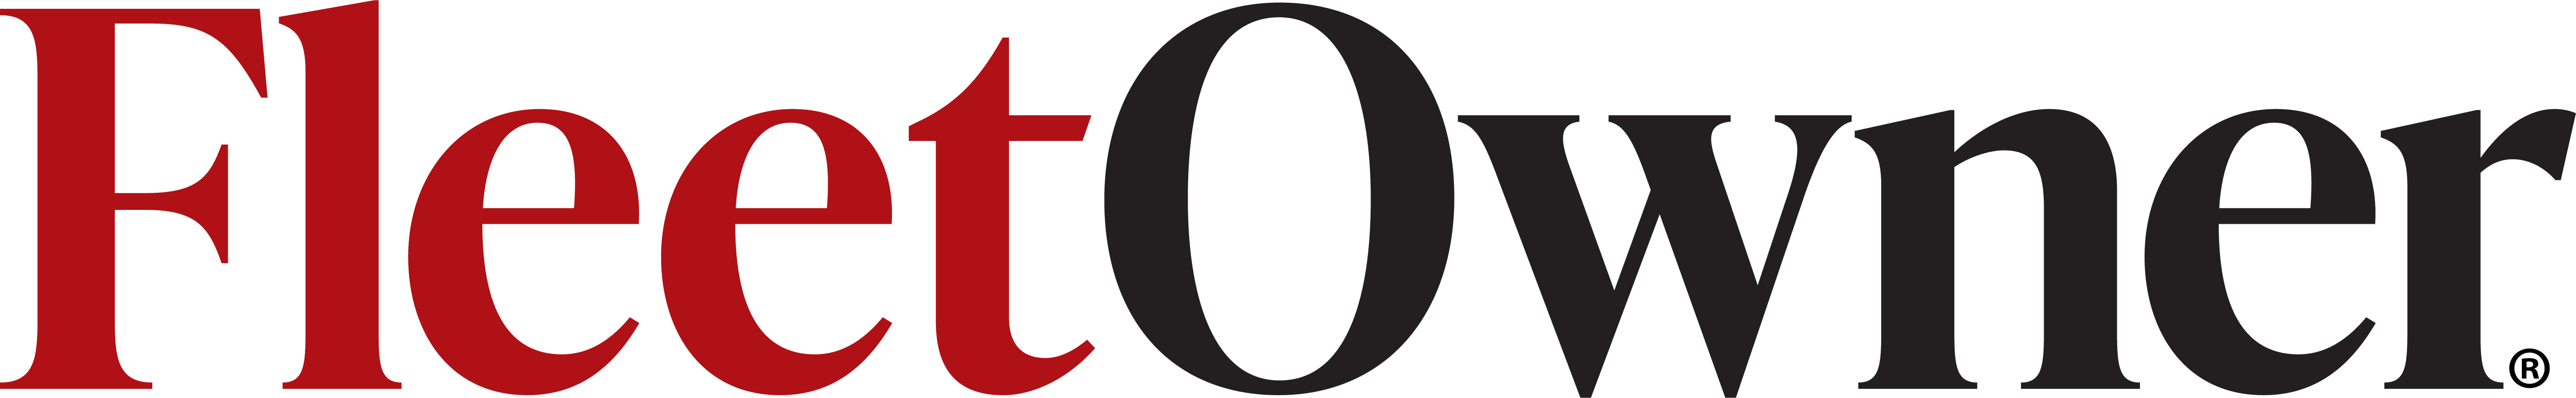 fleetowner_logo_2021_brand